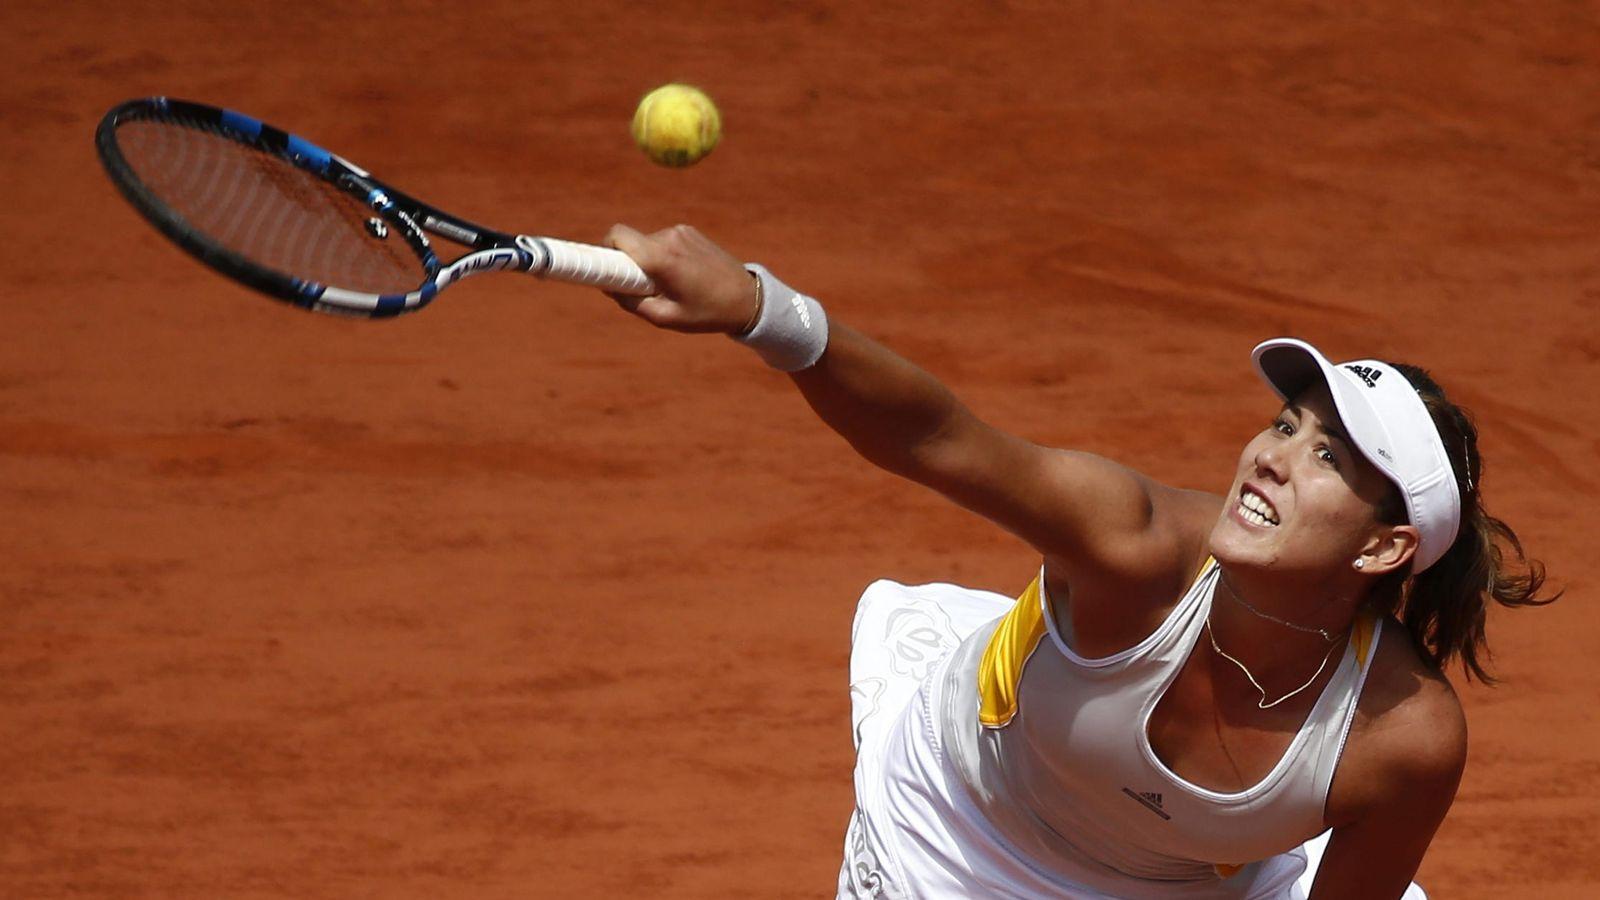 Foto: Garbiñe Muguruza, en un momento de su partido ante Lucie Safarova.